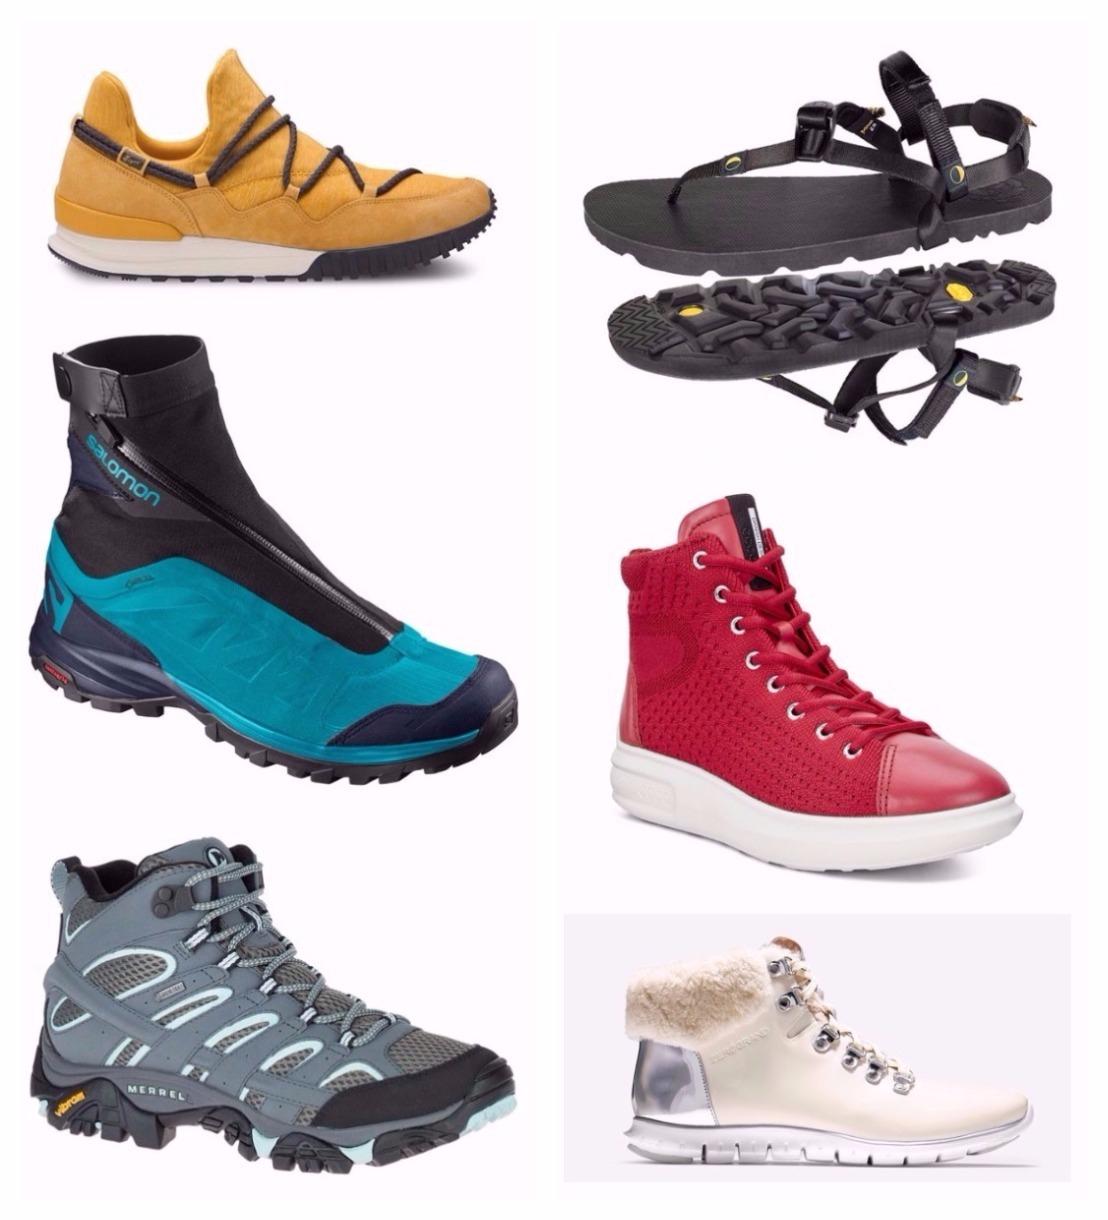 fashionable hiking shoes